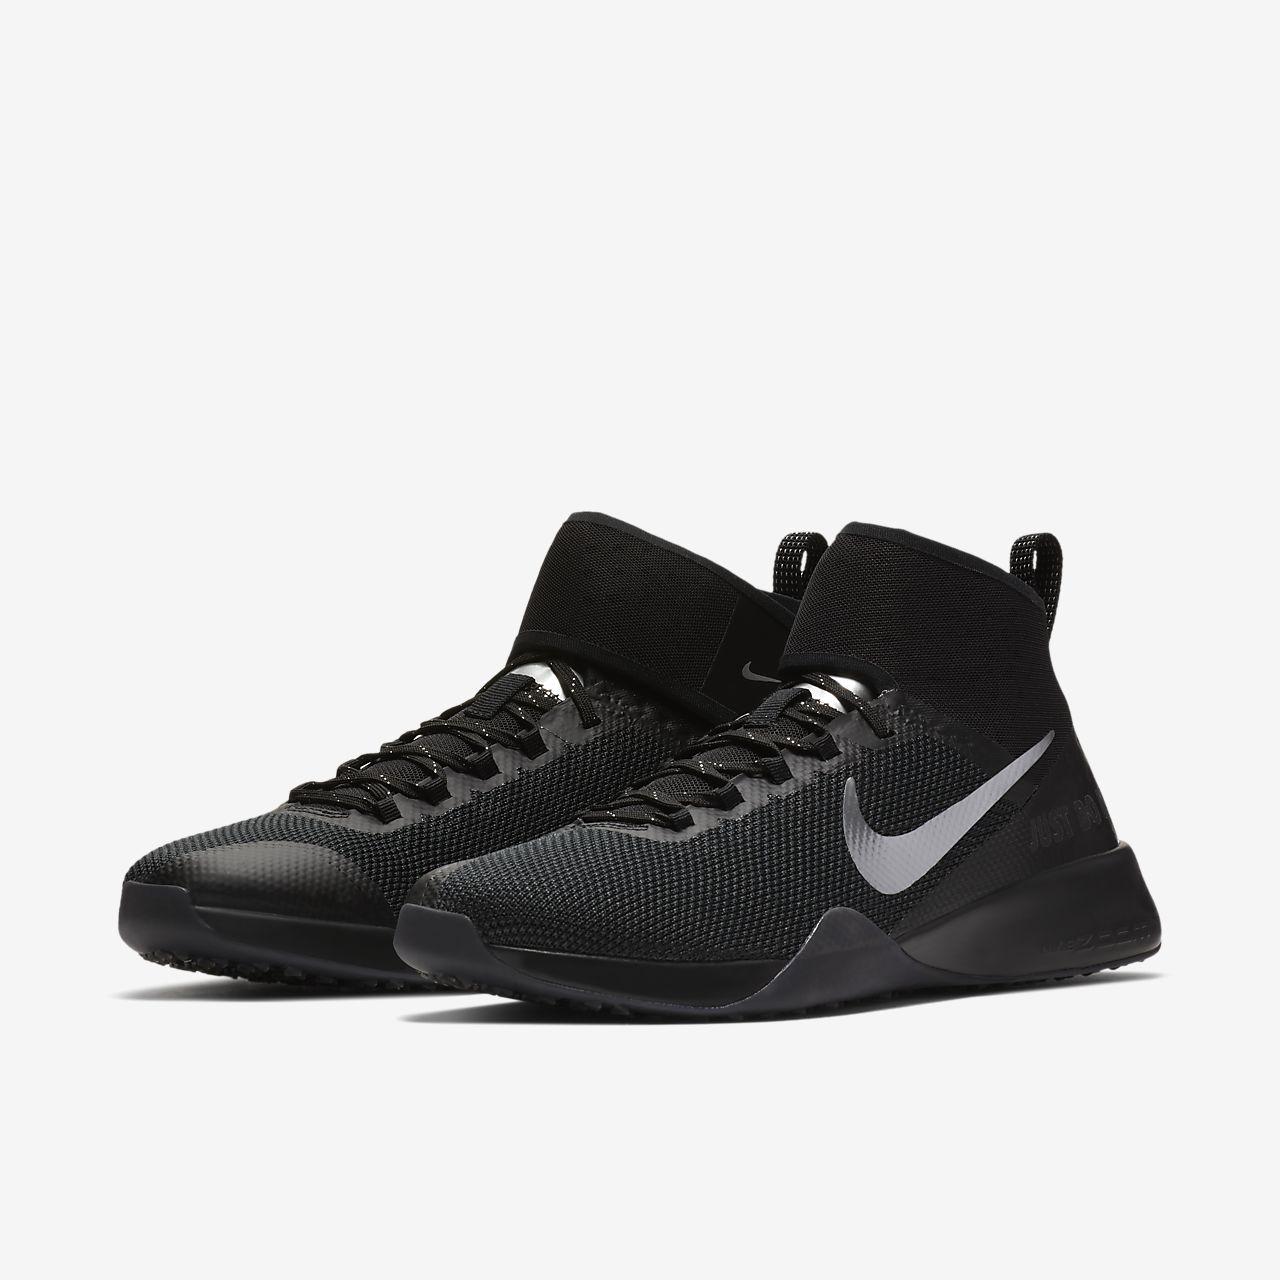 Nike Air Formation Zoom Forts Formateurs Selfie - Noir / Chrome rOAwJ1